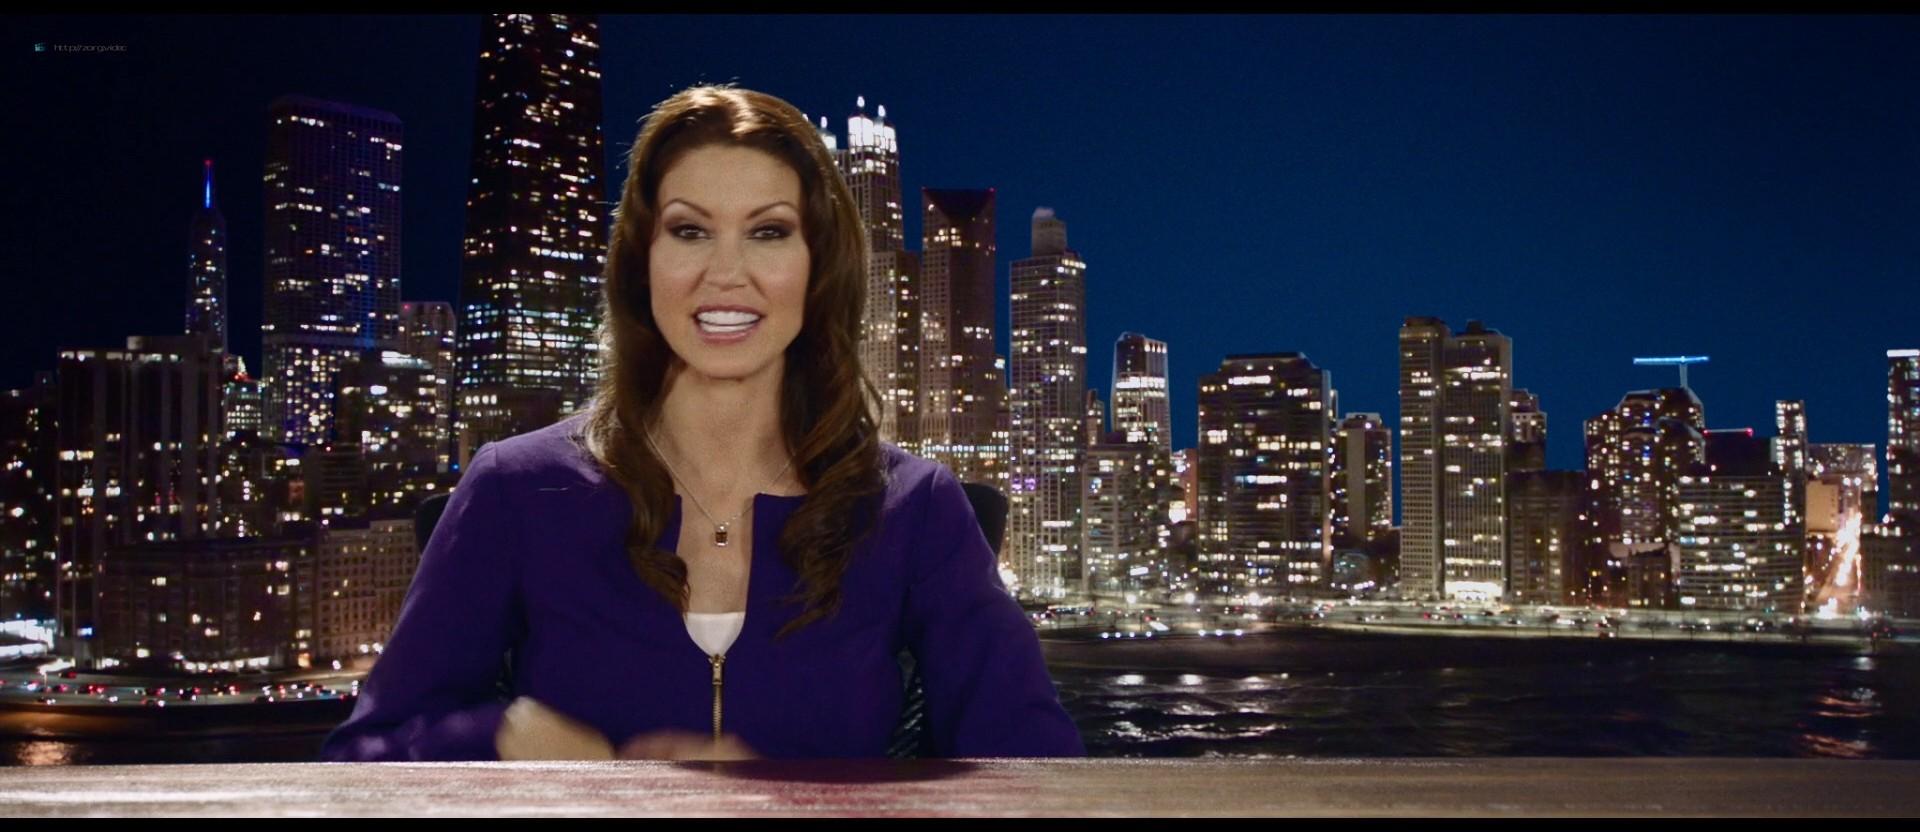 Melissa Benoist hot Shannon Elizabeth sexy - Jay and Silent Bob Reboot (2019) HD 1080p BluRay (20)